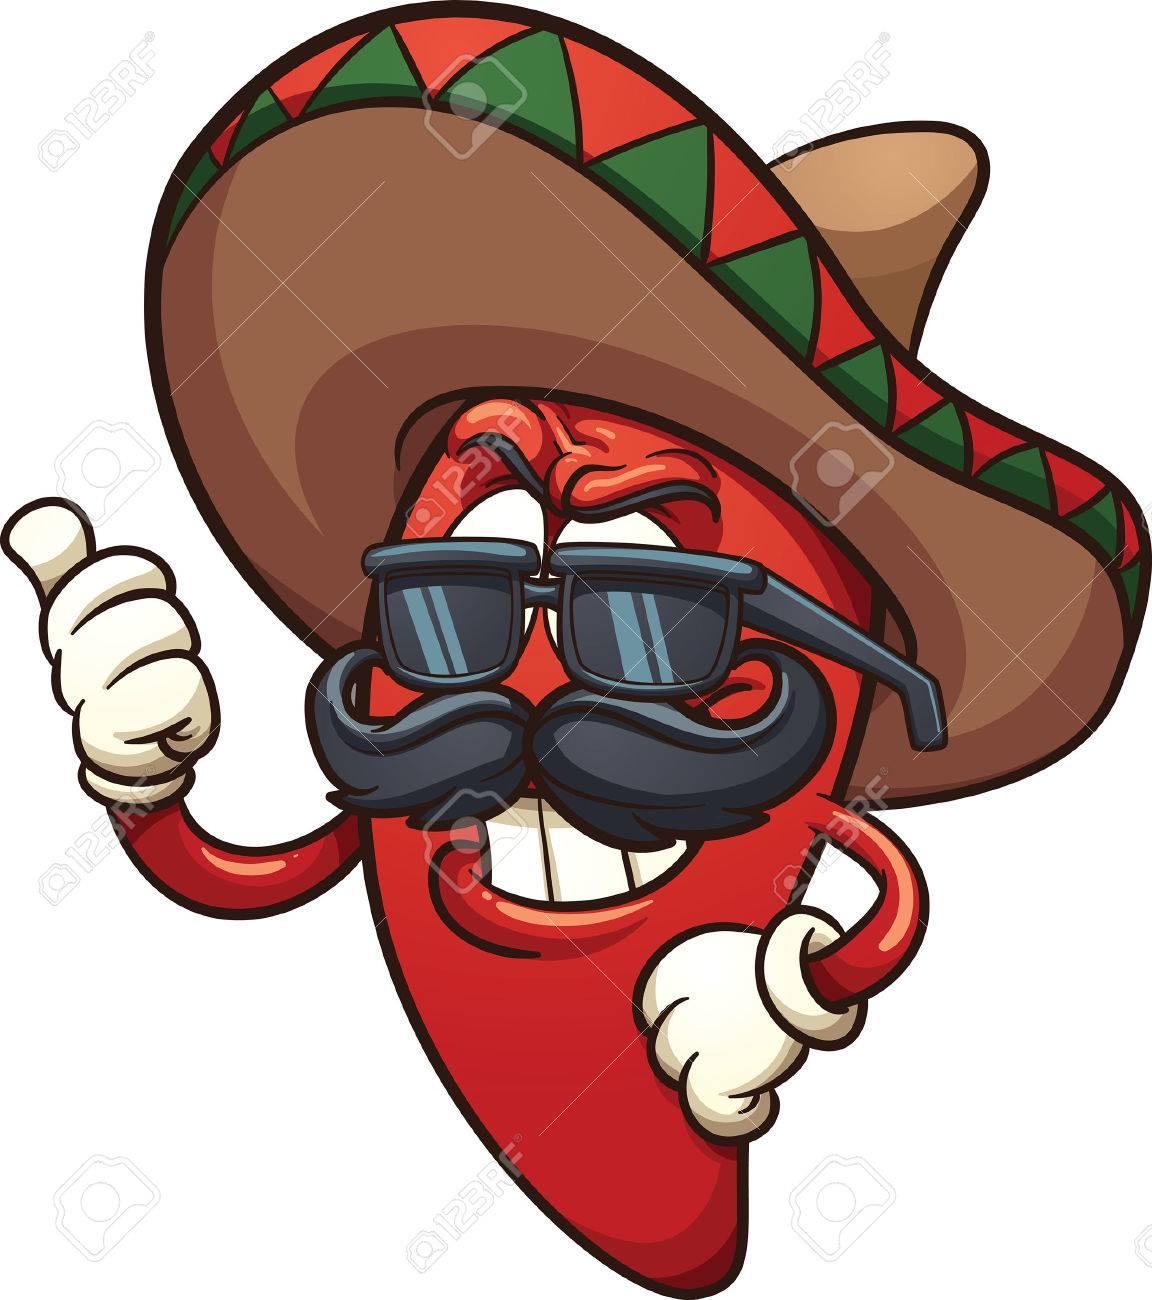 1152x1300 Cool Mexican Chili Pepper. Vector Clip Art Illustration